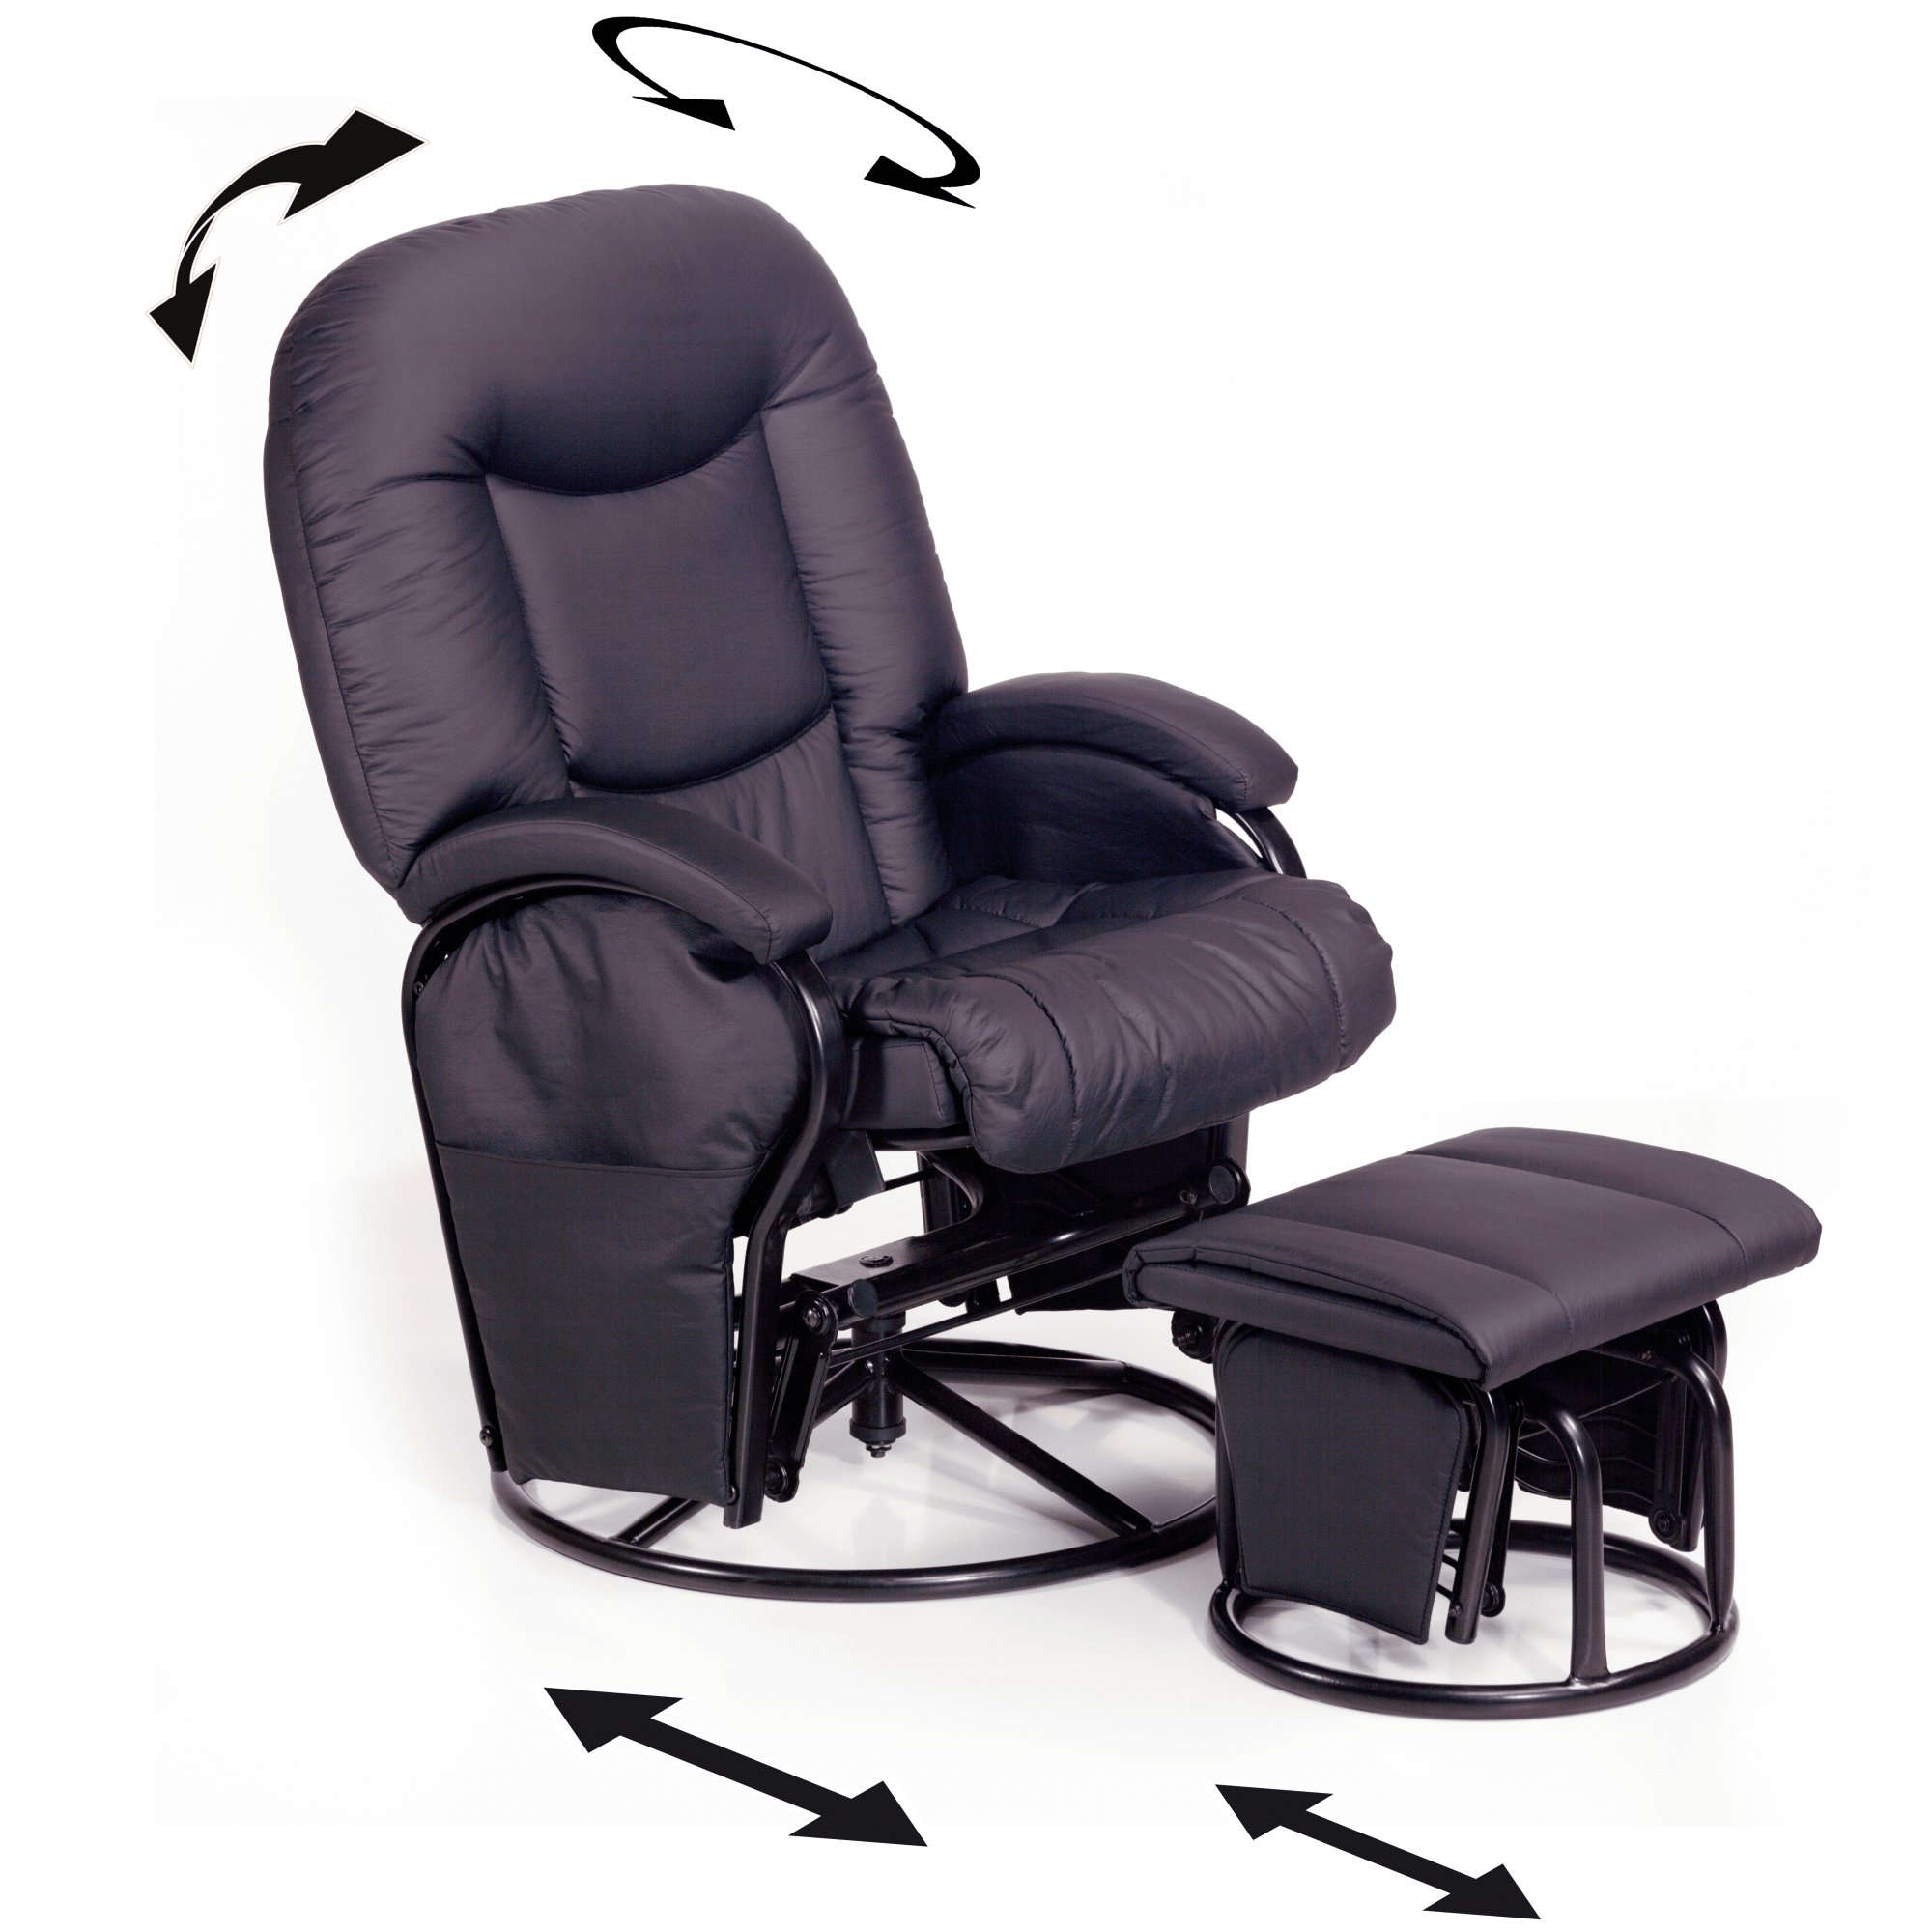 Inkl skammel - Komfortabel lænestol med justerbar ryg og 360° rotation